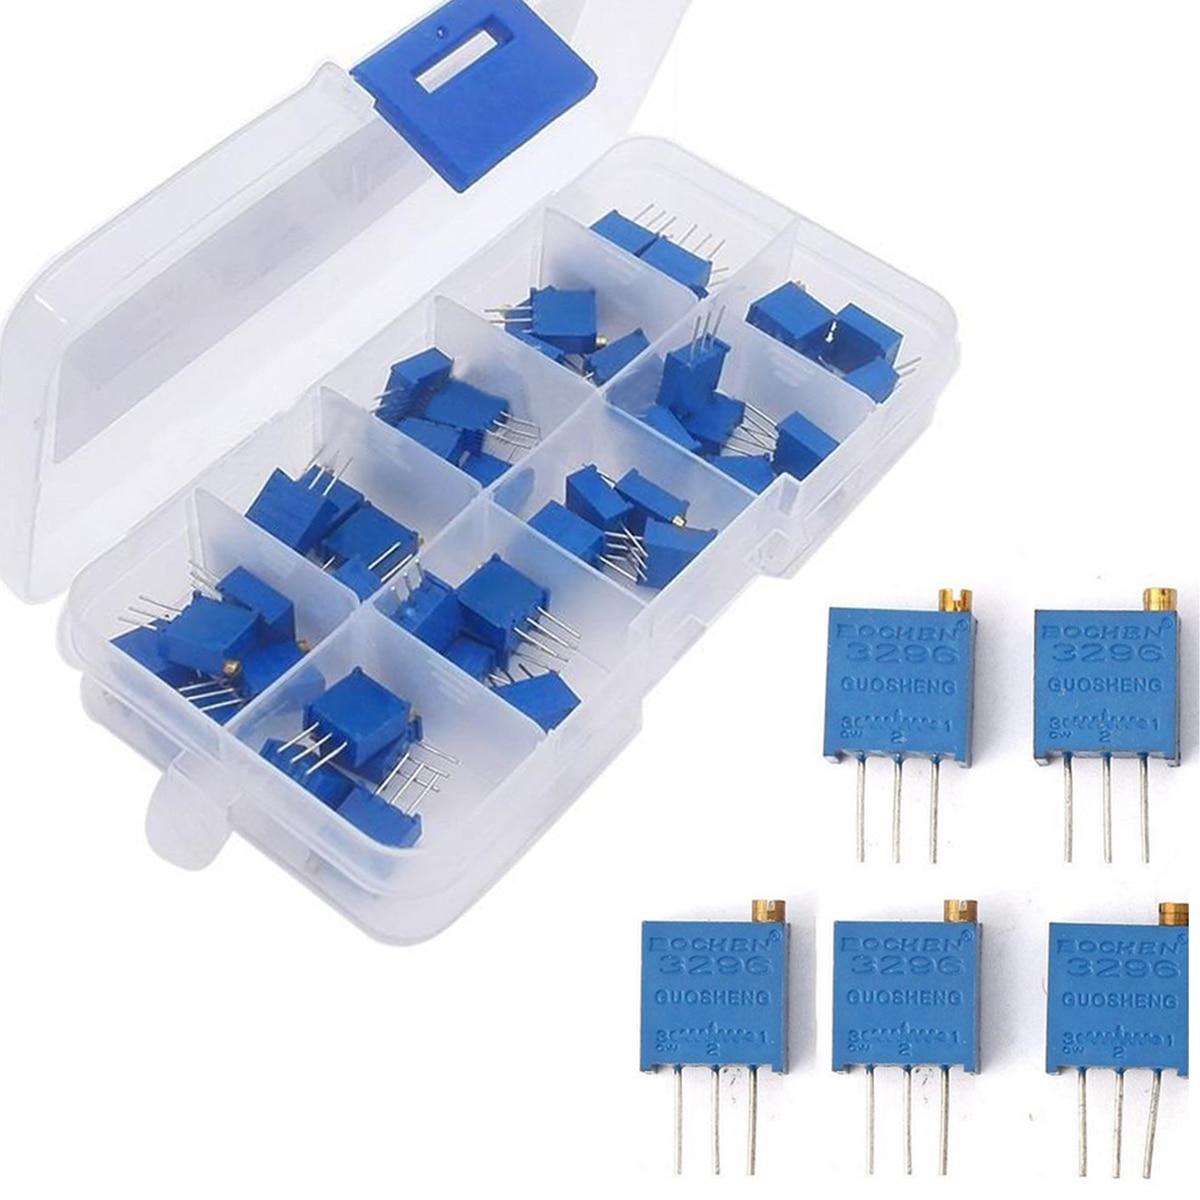 50pcs 3296W Trimmer Potentiometer Kit 10 Value Multiturn Variable Resistor Set with Plastic Box 50pcs 3296w 200 ohm multiturn potentiometer pot variable resistor